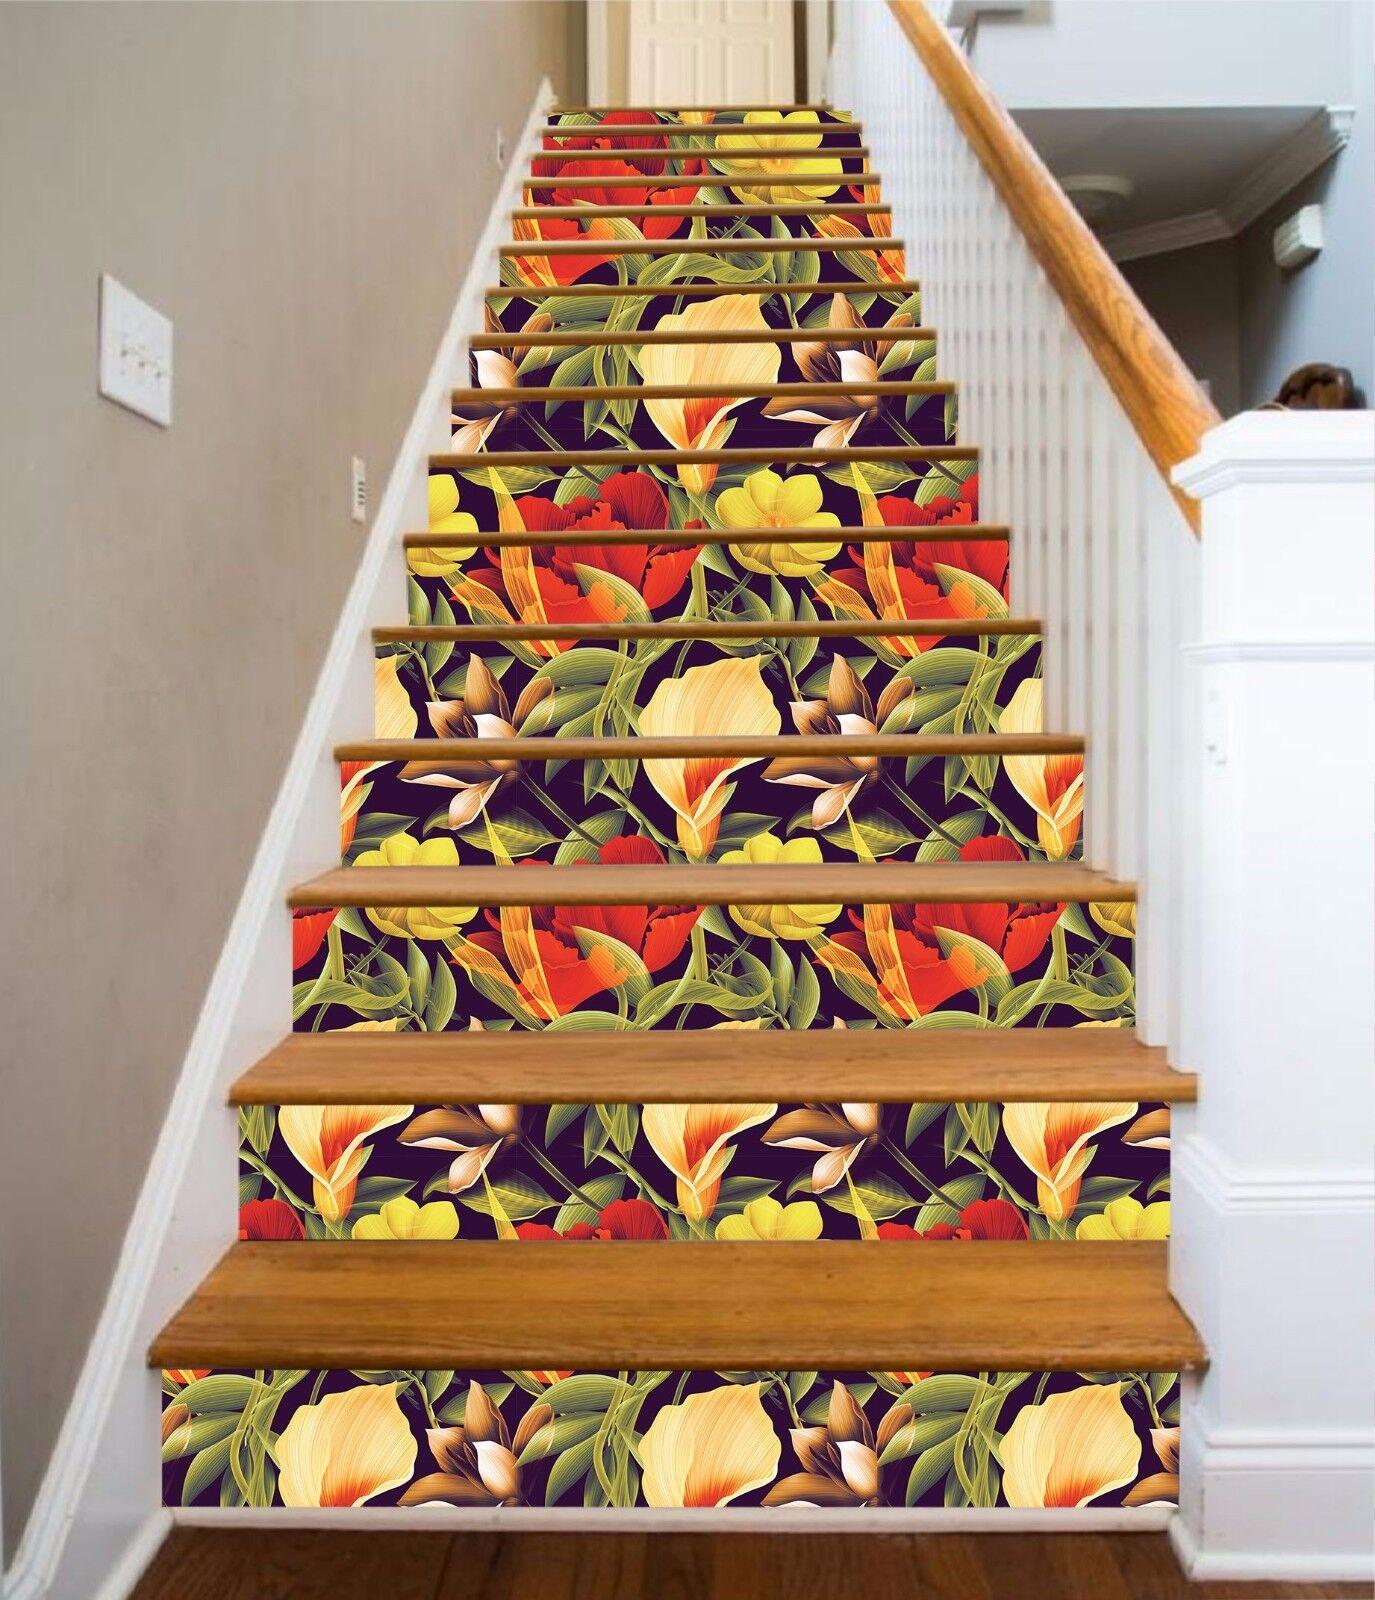 3D Fresh Flower 851 Stair Risers Decoration Photo Mural Vinyl Decal WandPapier AU